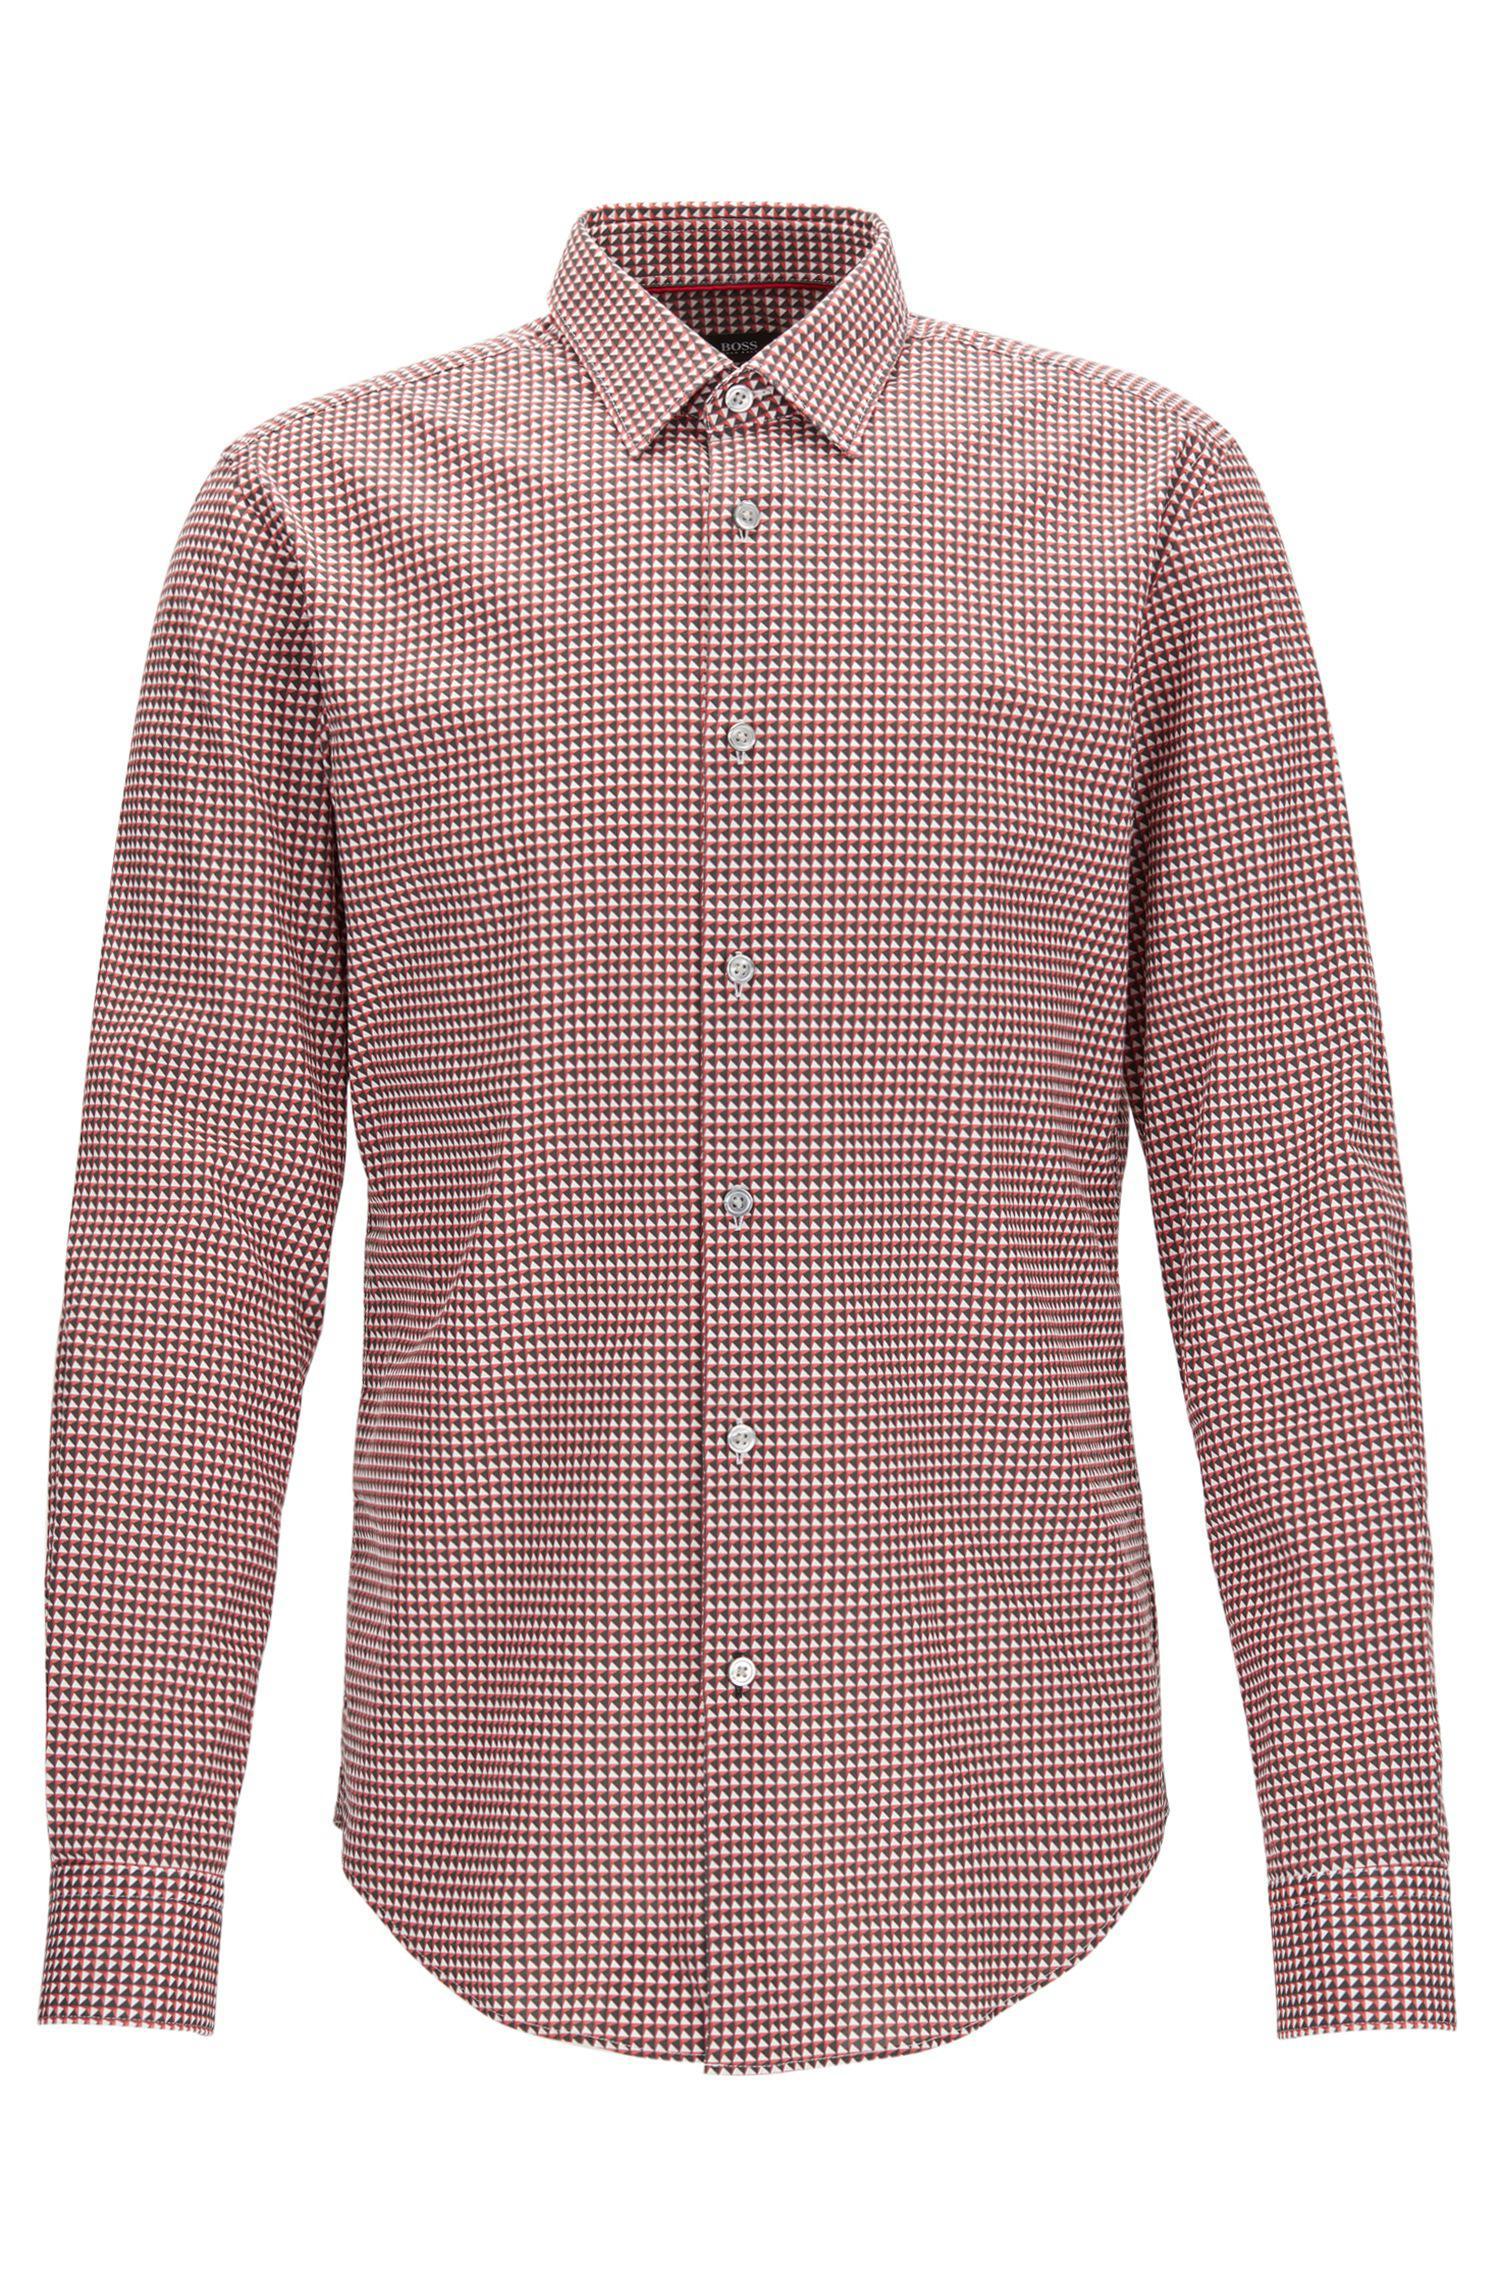 6a995bdb BOSS Geometric Stretch Cotton Sport Shirt, Slim Fit   Ronni F in Red ...